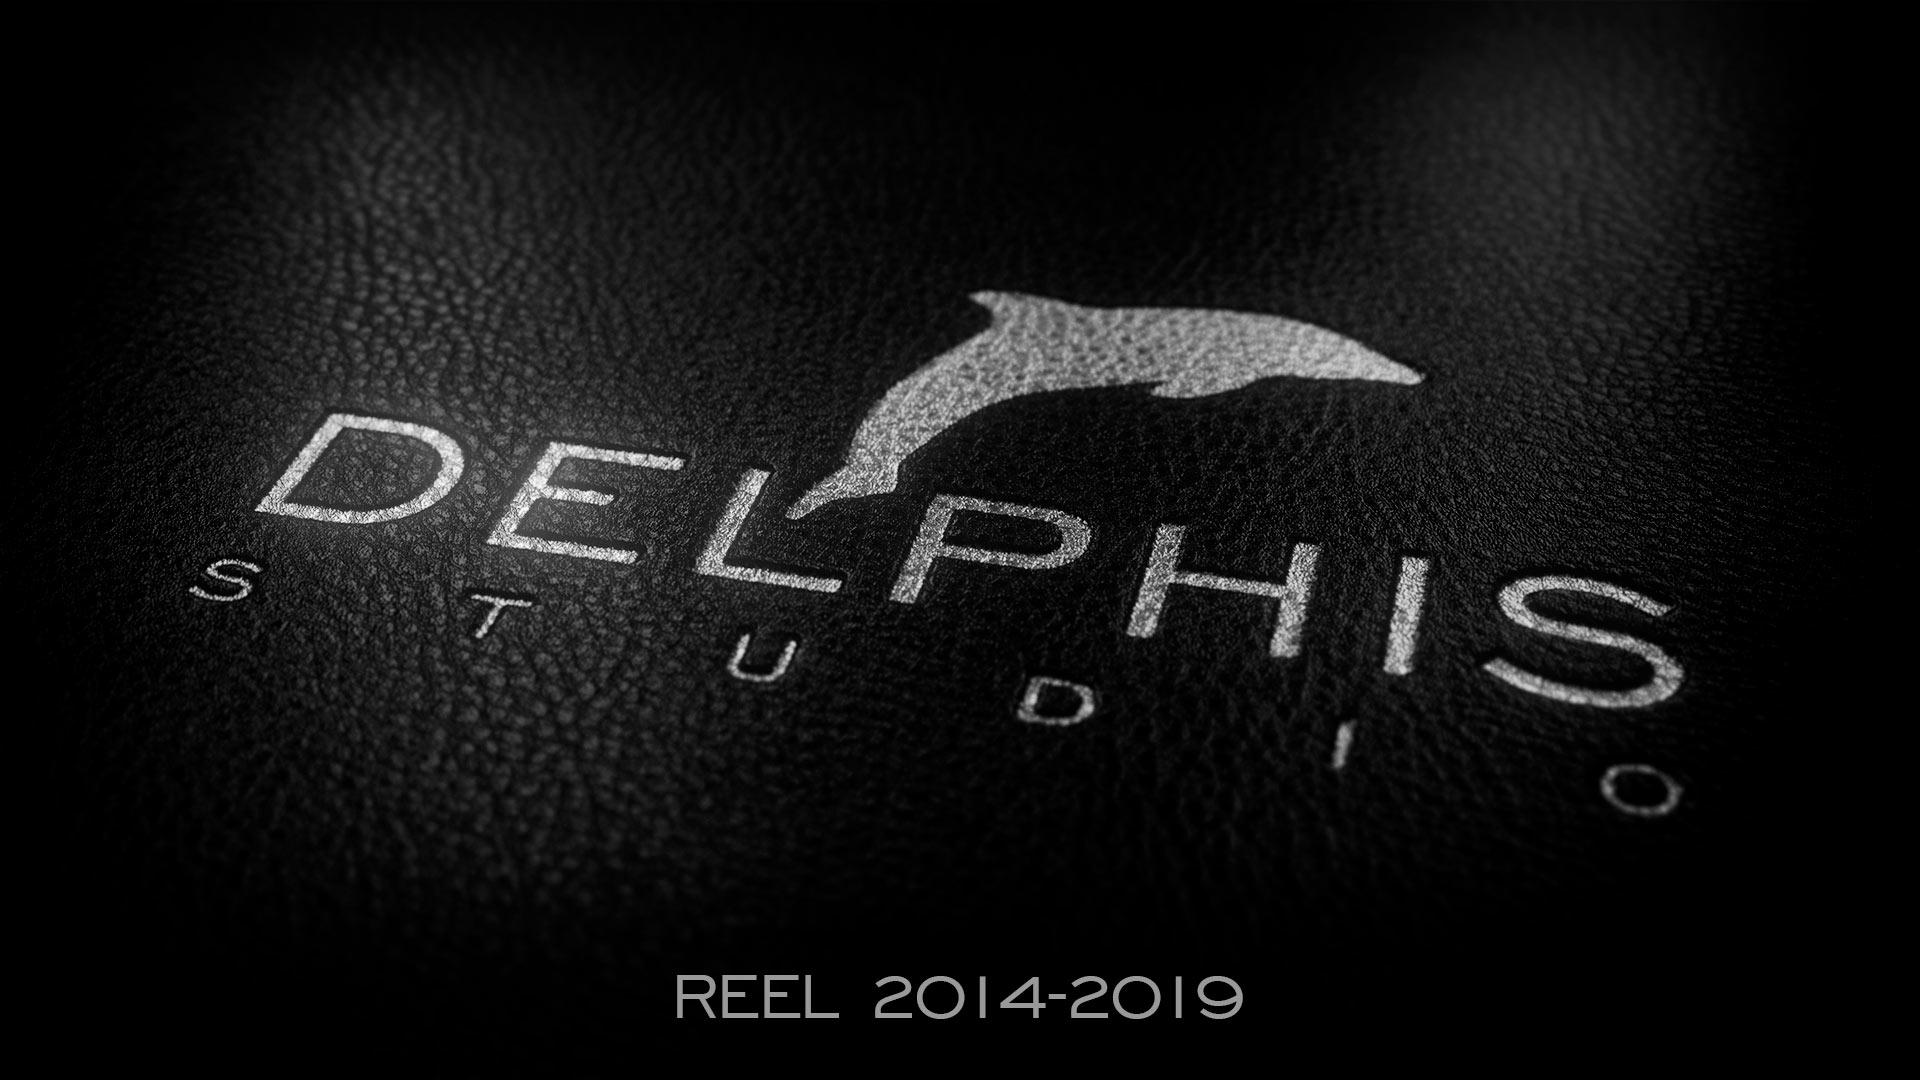 REEL 2004-2019